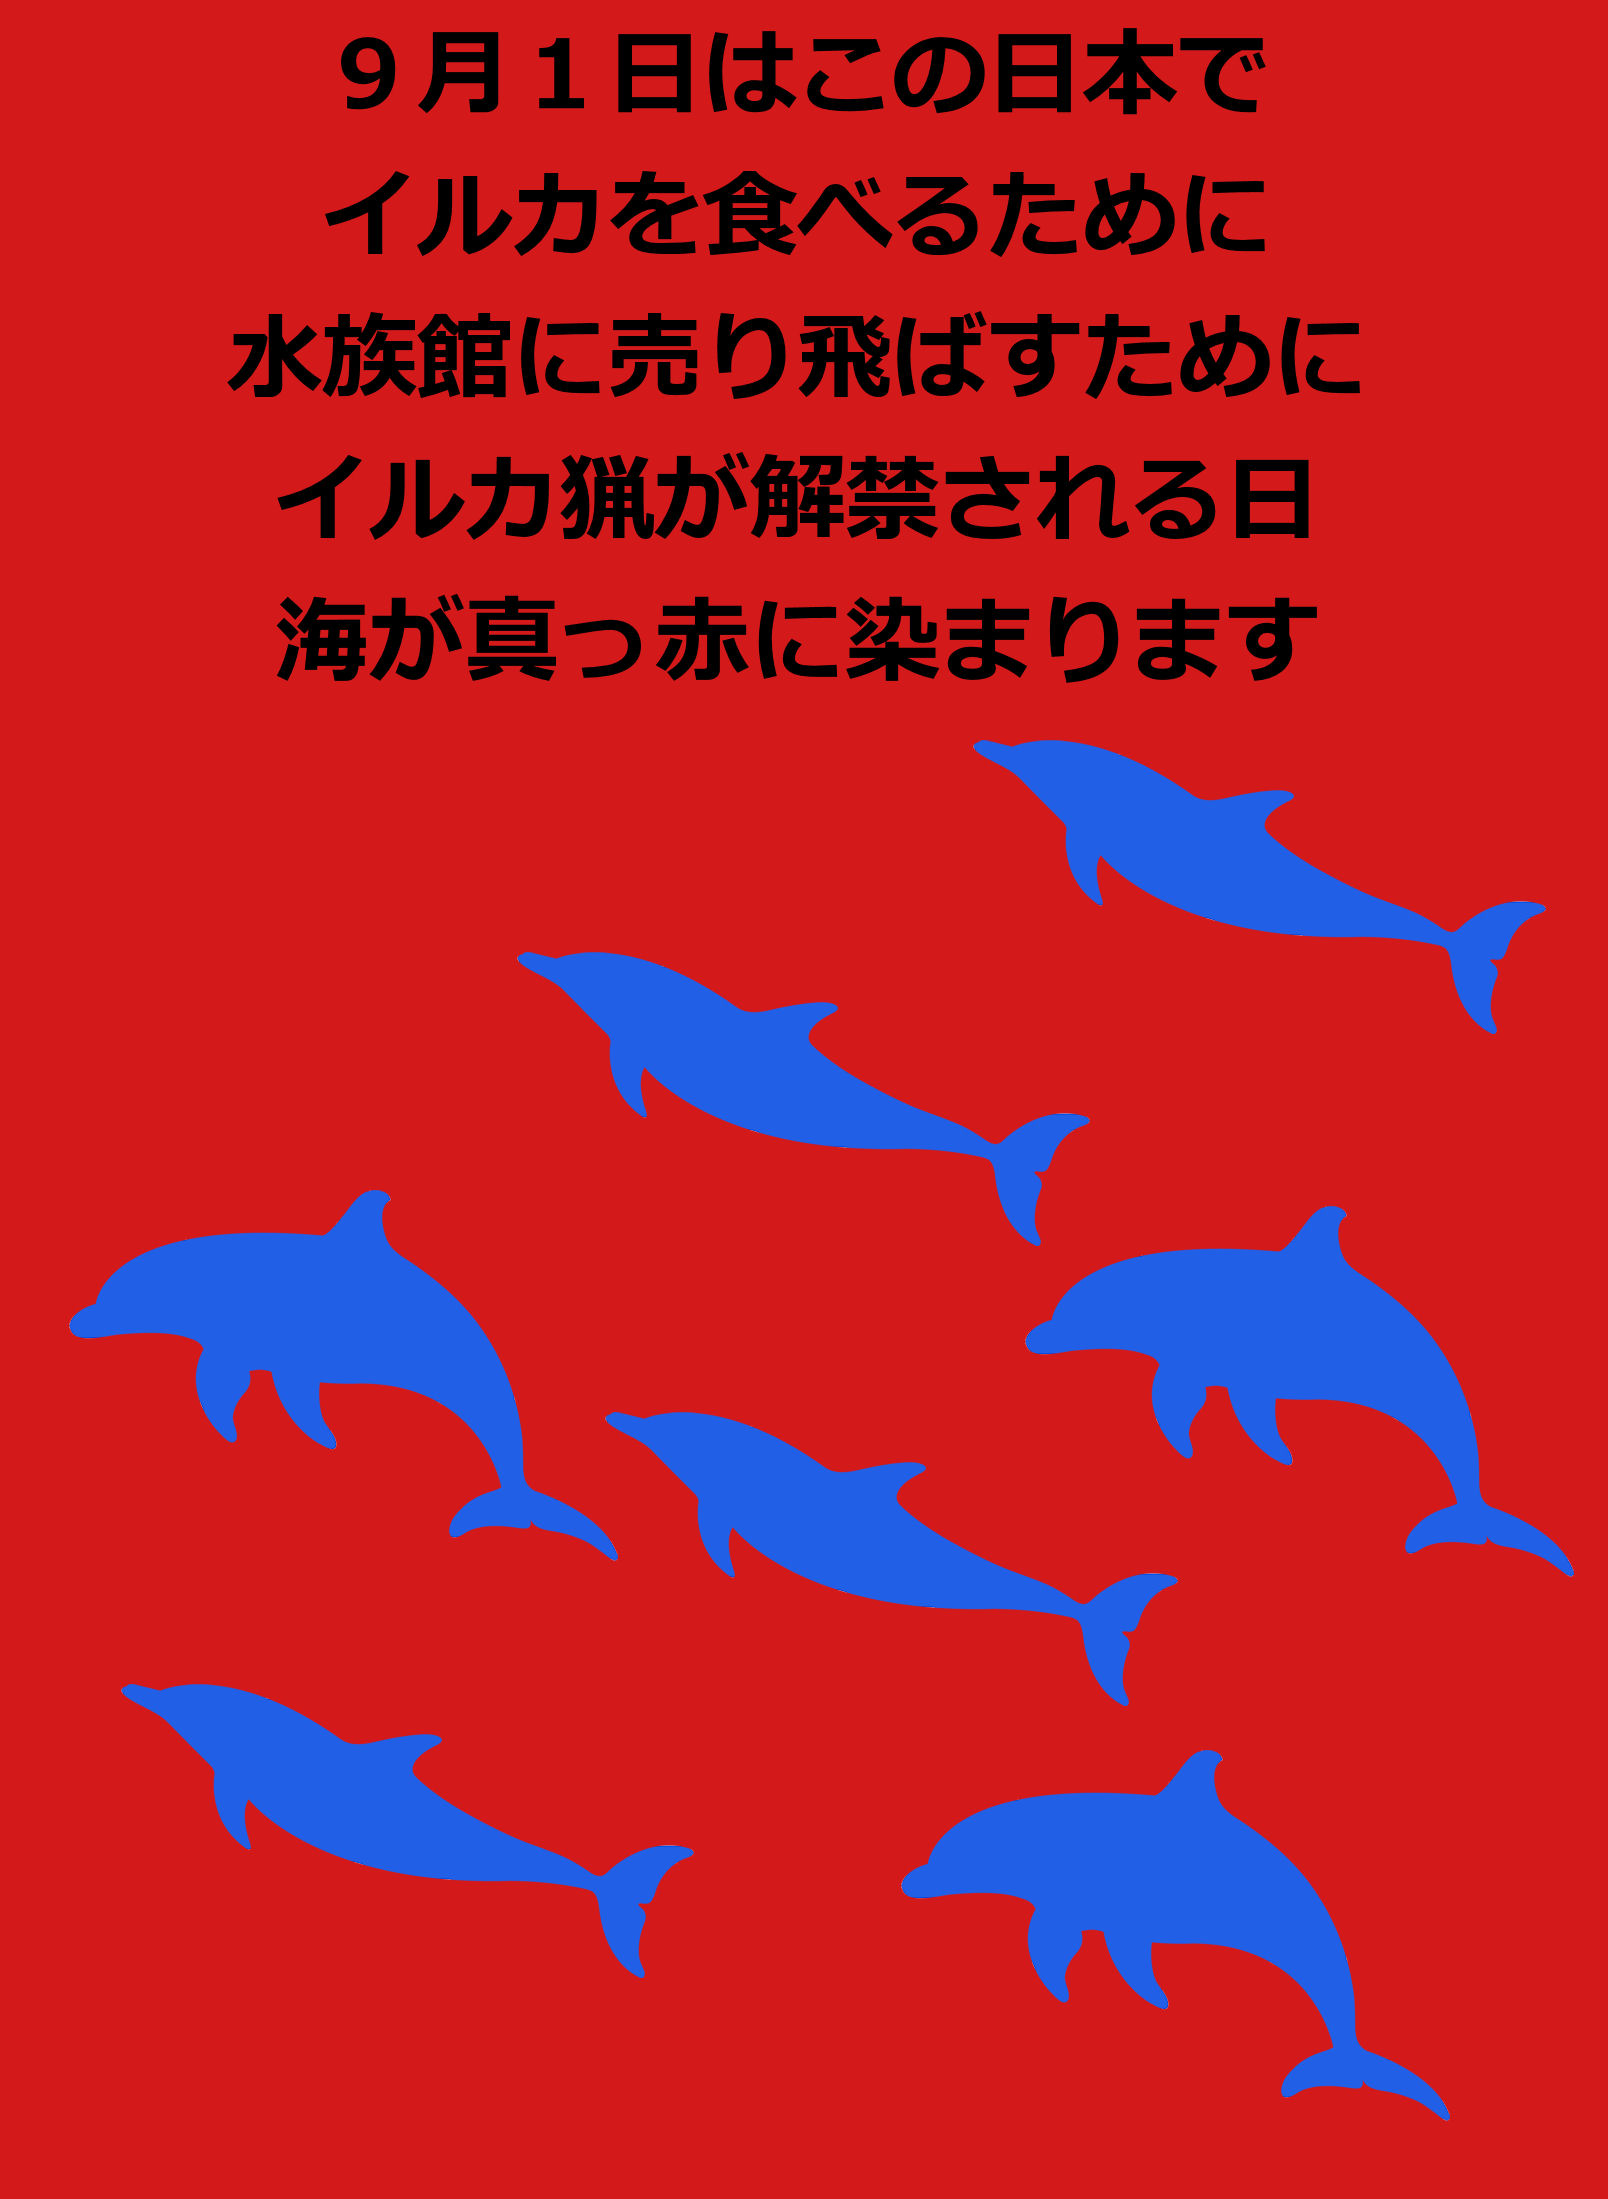 japandolphinsday2.jpg